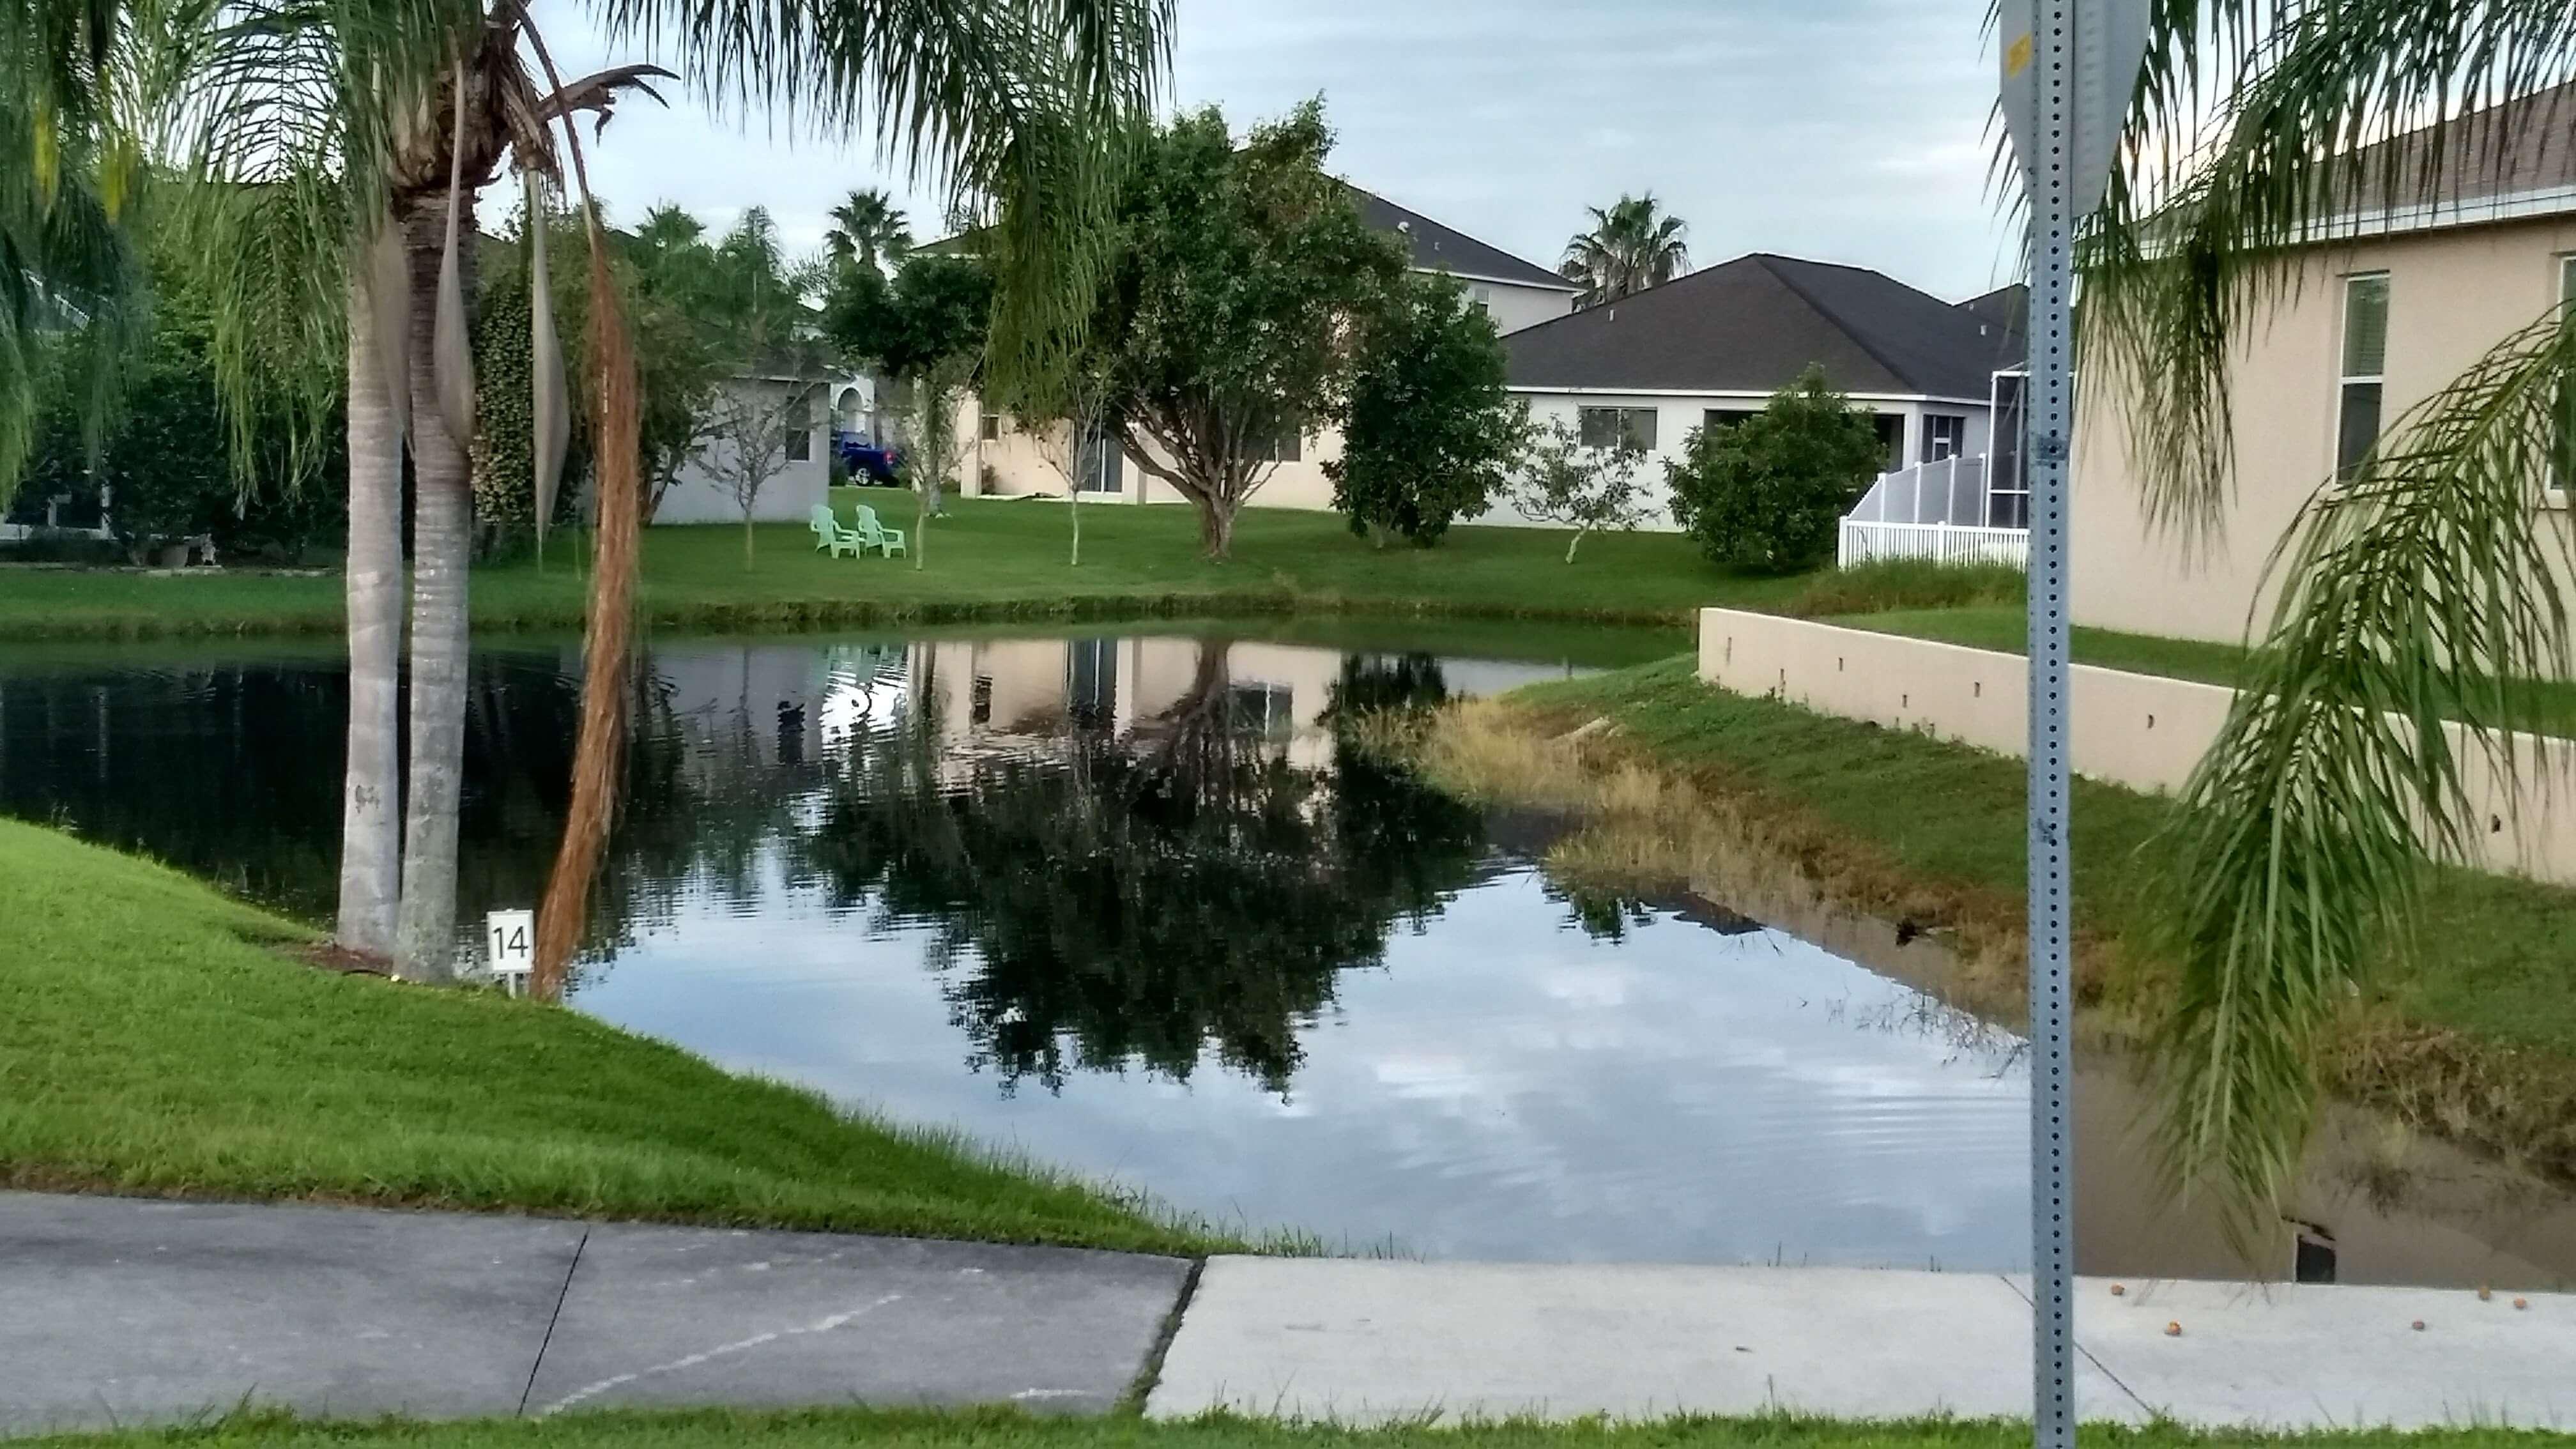 Picturesque Pond Views